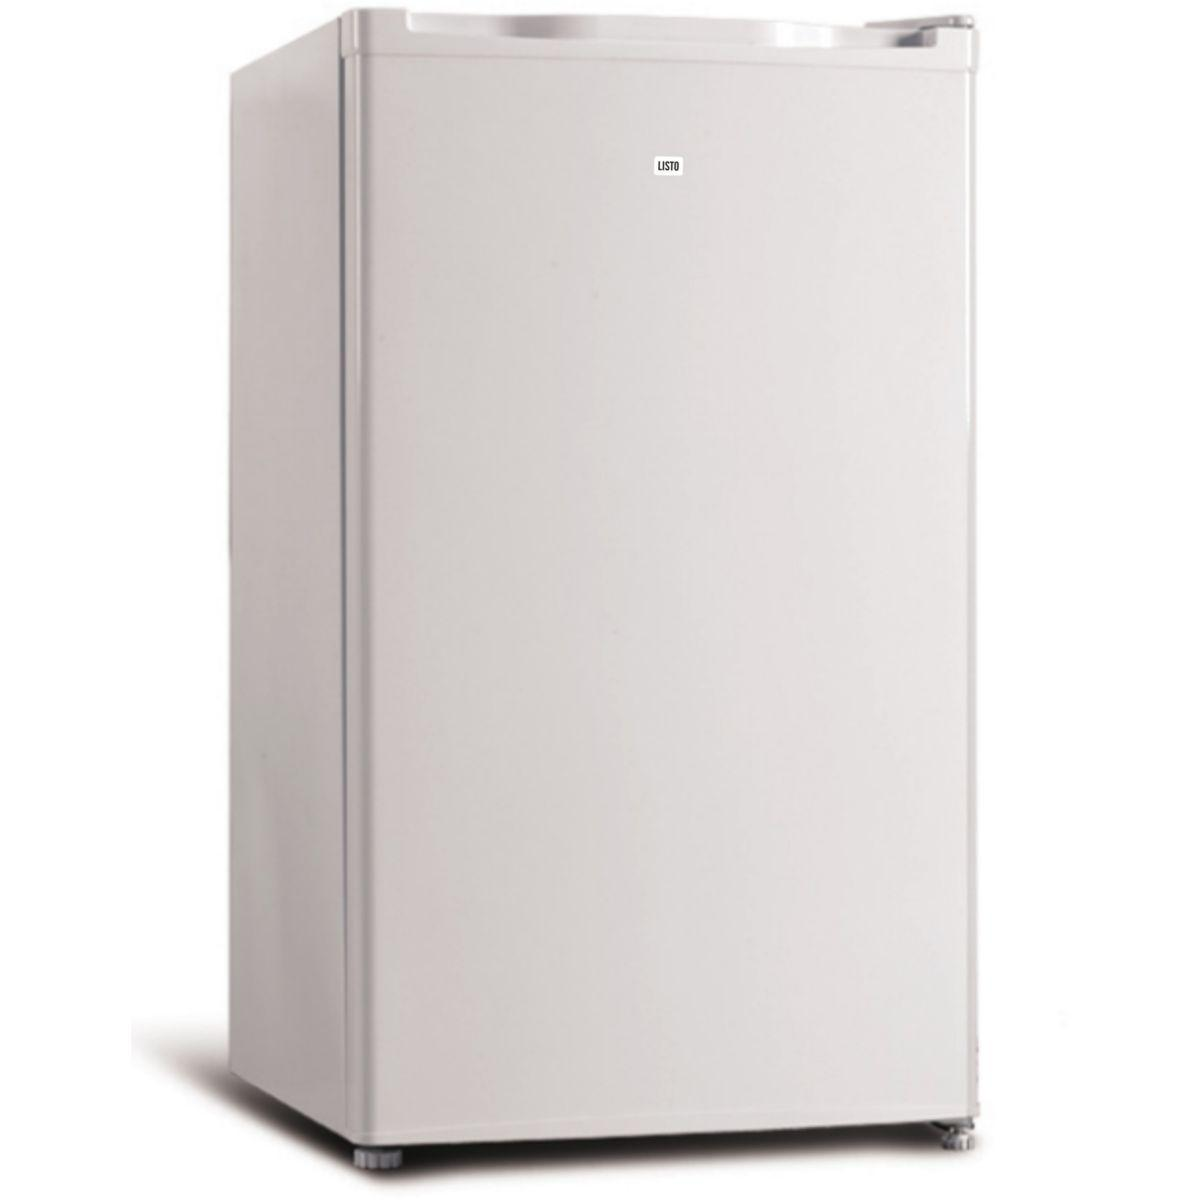 Réfrigérateur Top LISTO RTFL85-50b2